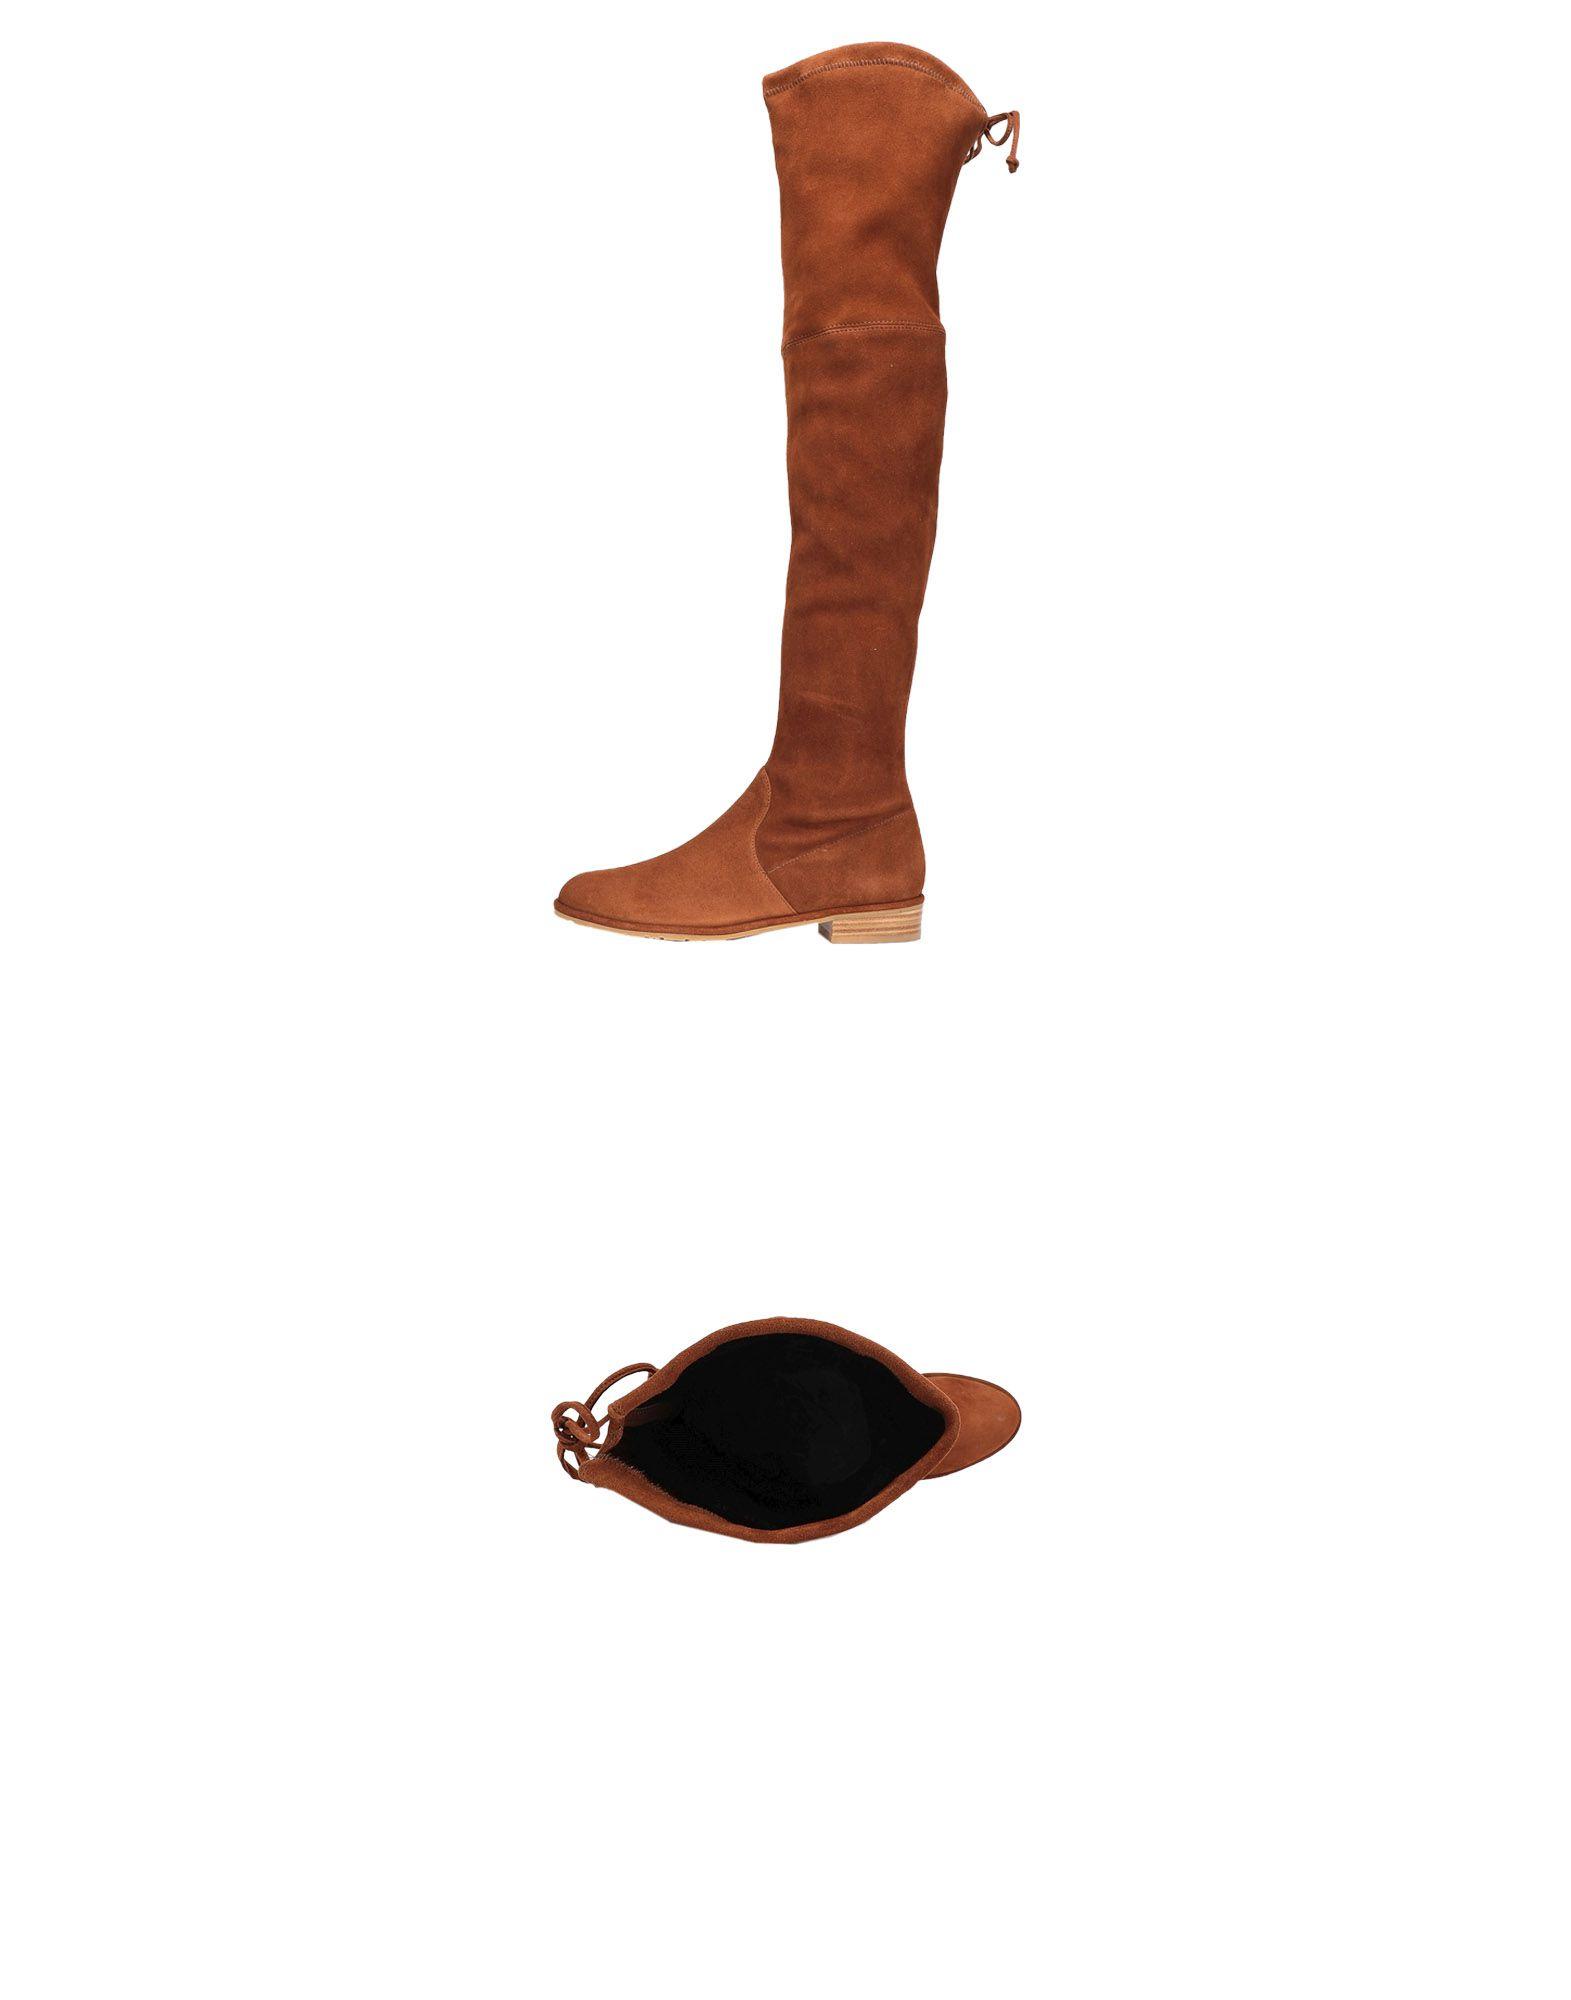 Stuart Weitzman Boots - Women on Stuart Weitzman Boots online on Women  Canada - 11503790WG 2b6253